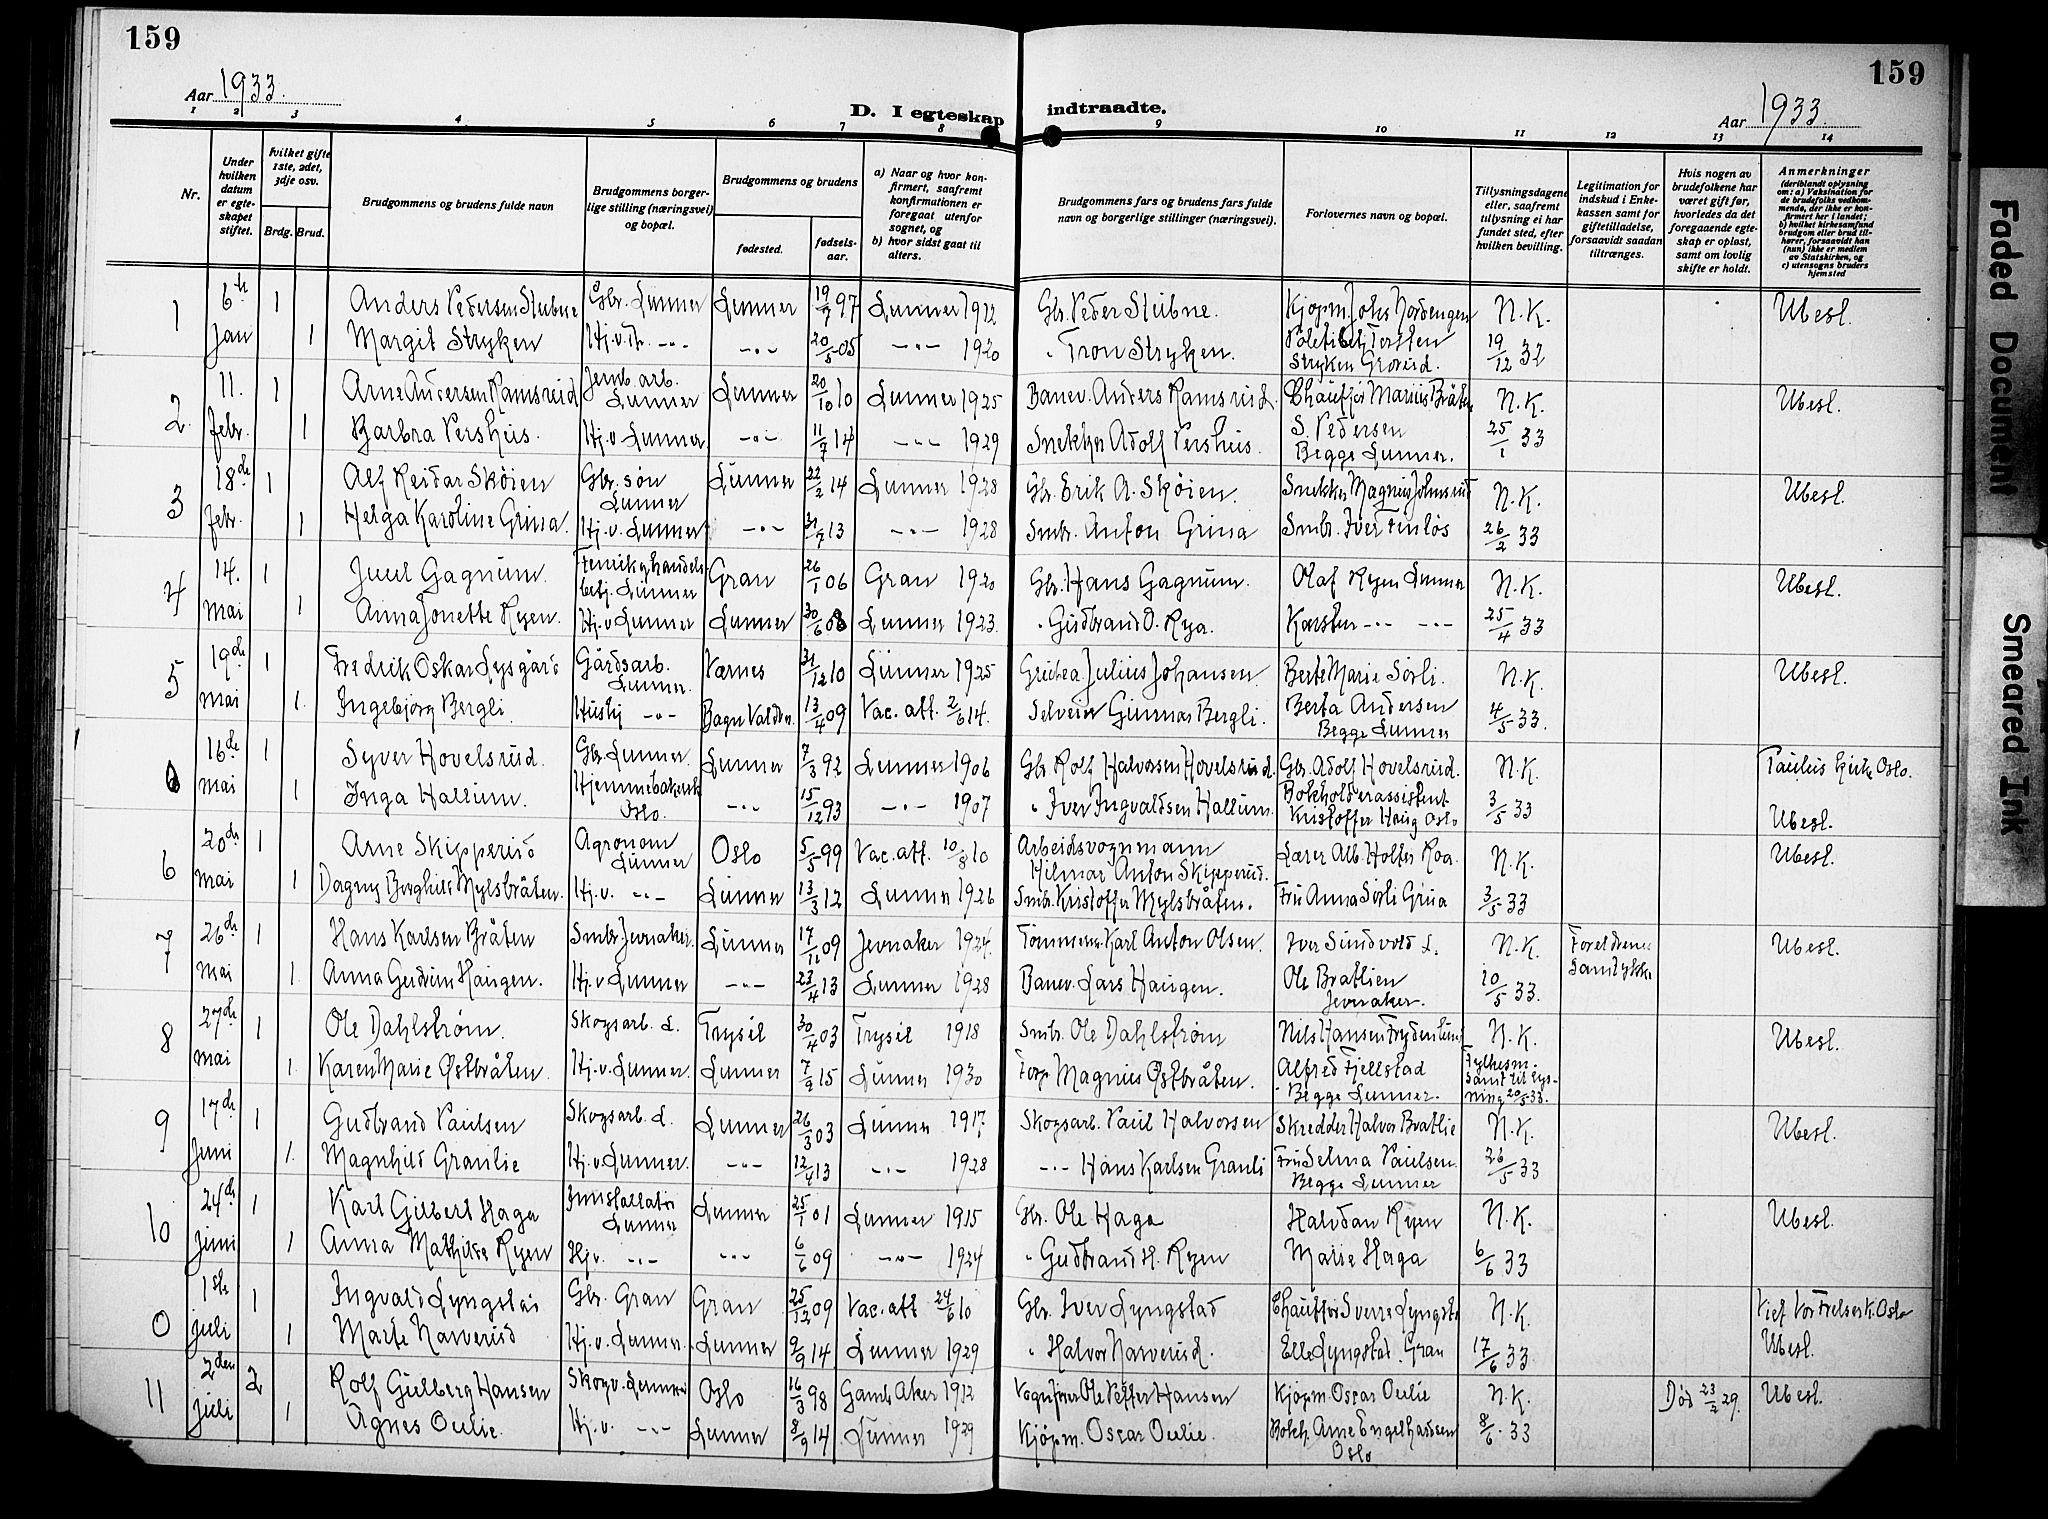 SAH, Lunner prestekontor, H/Ha/Hab/L0002: Klokkerbok nr. 2, 1923-1933, s. 159